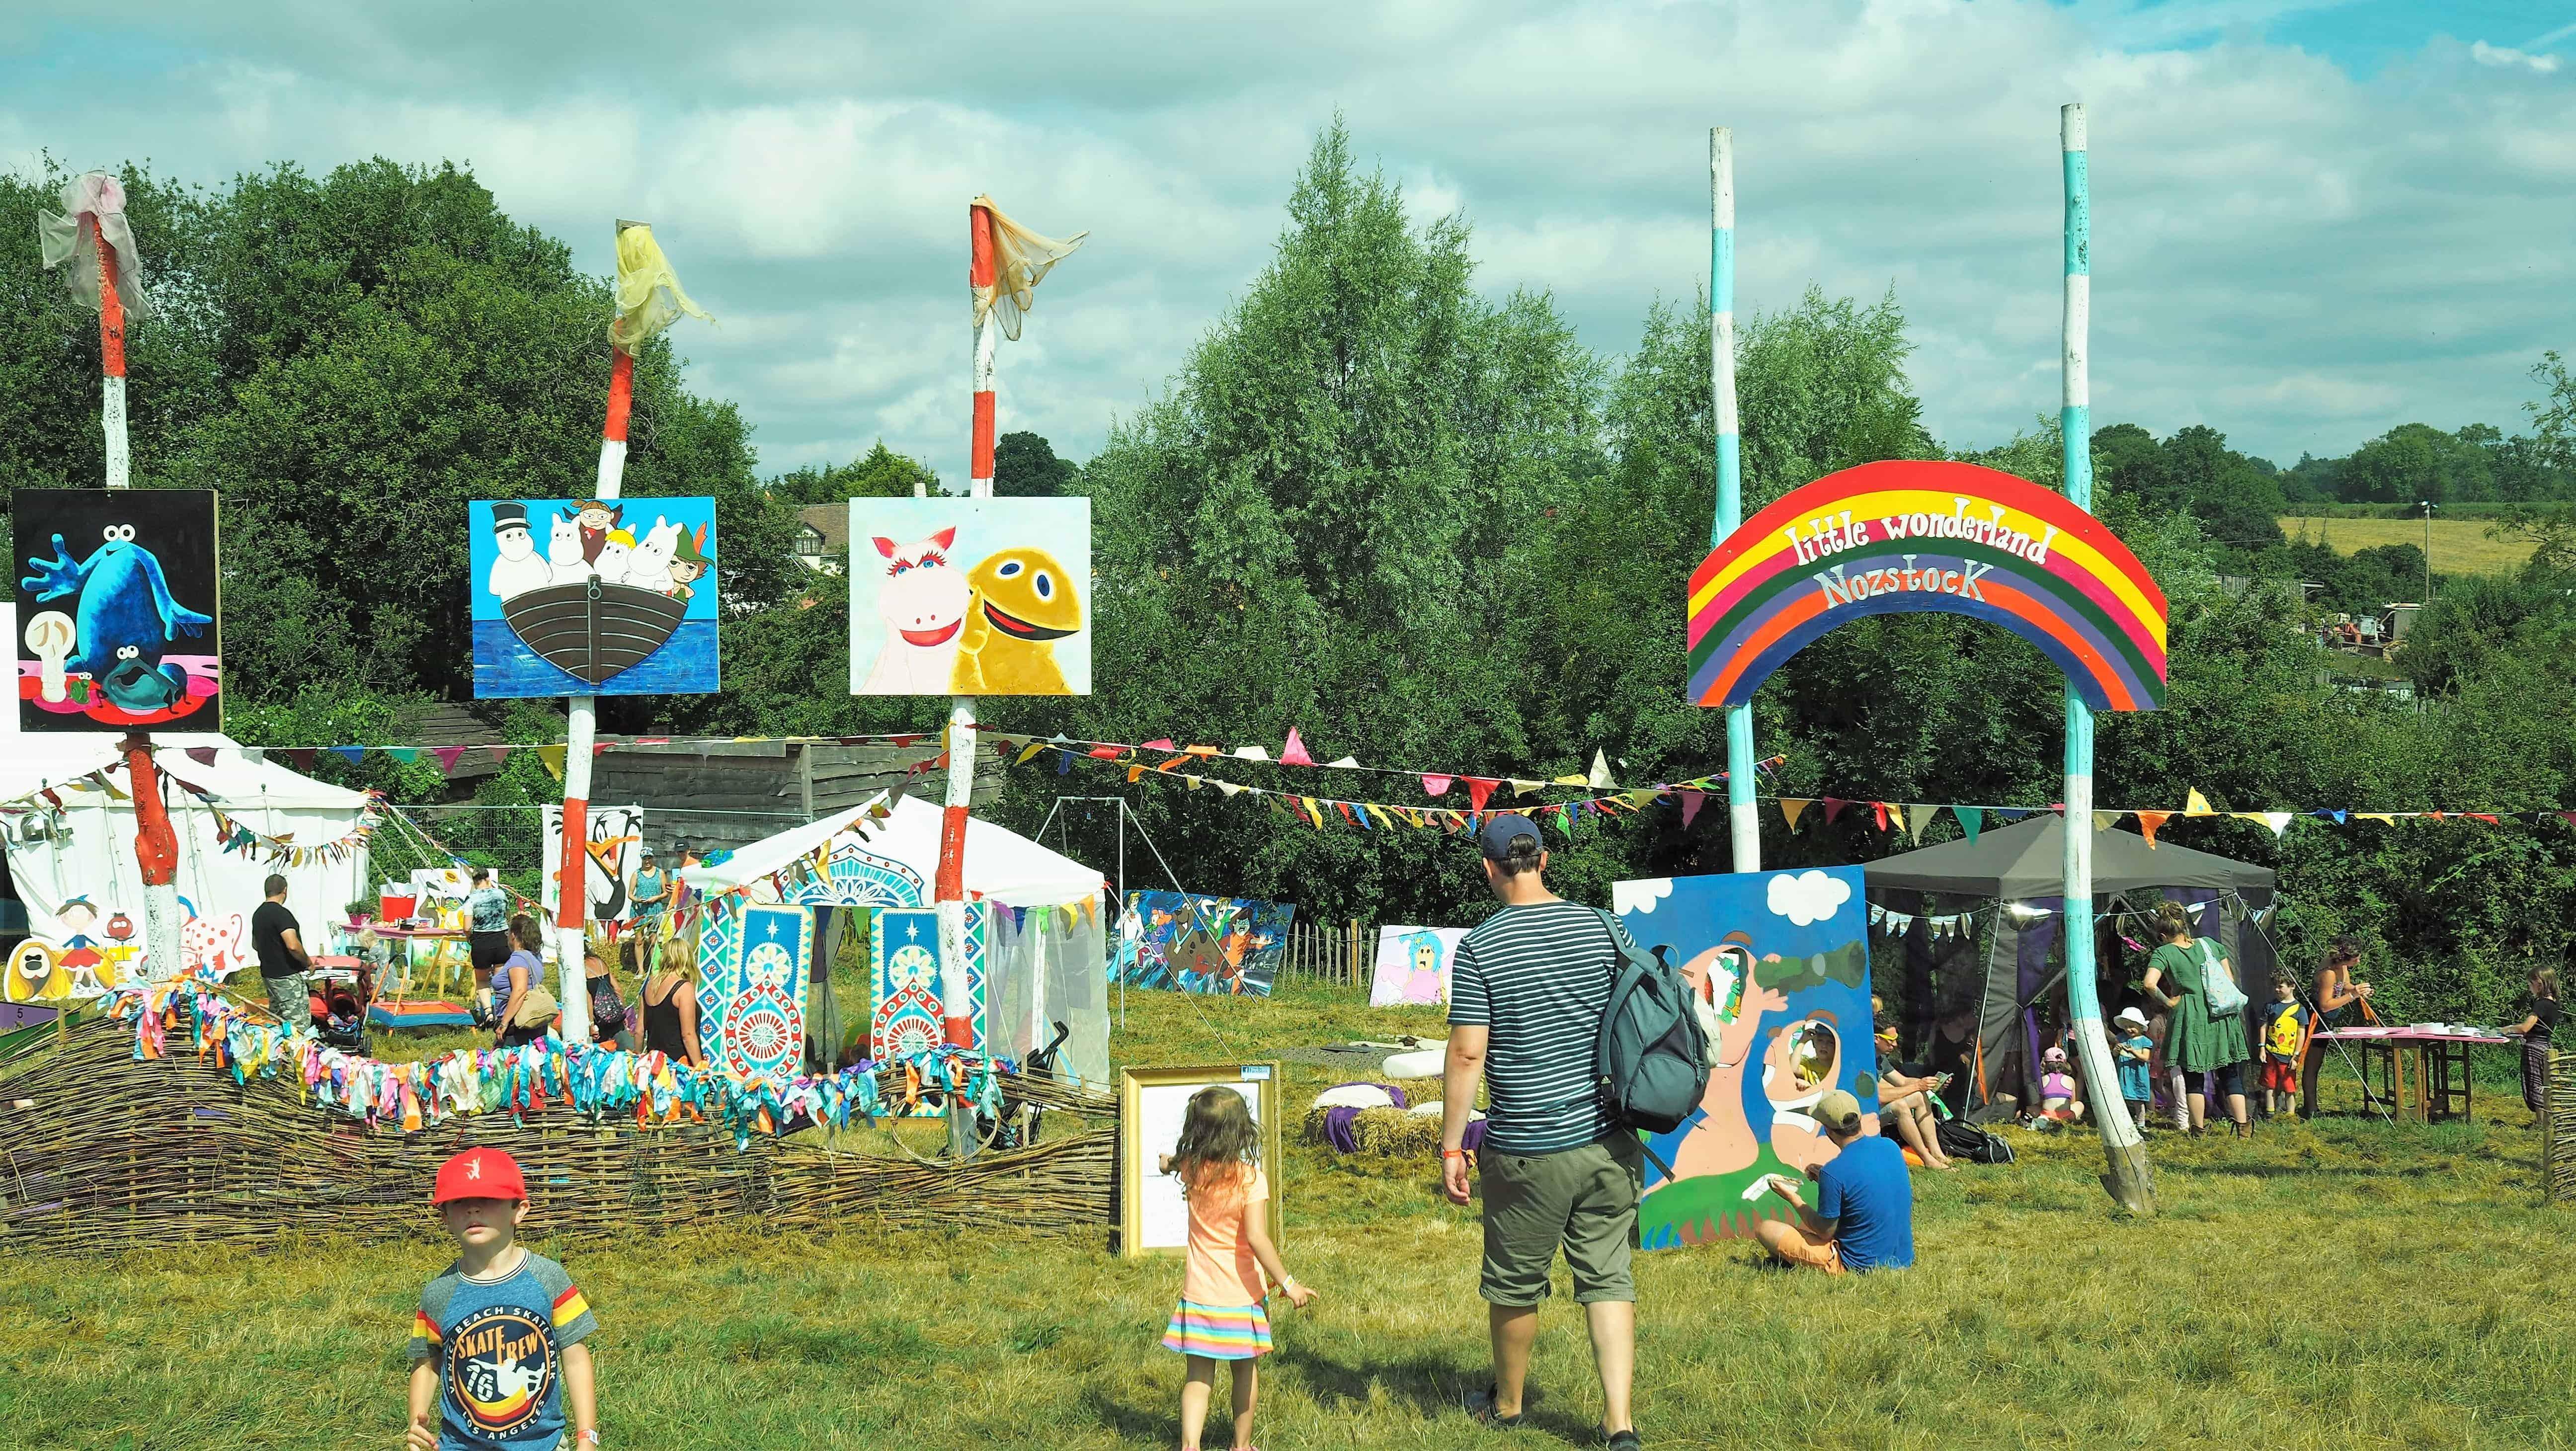 Nozstock family festival